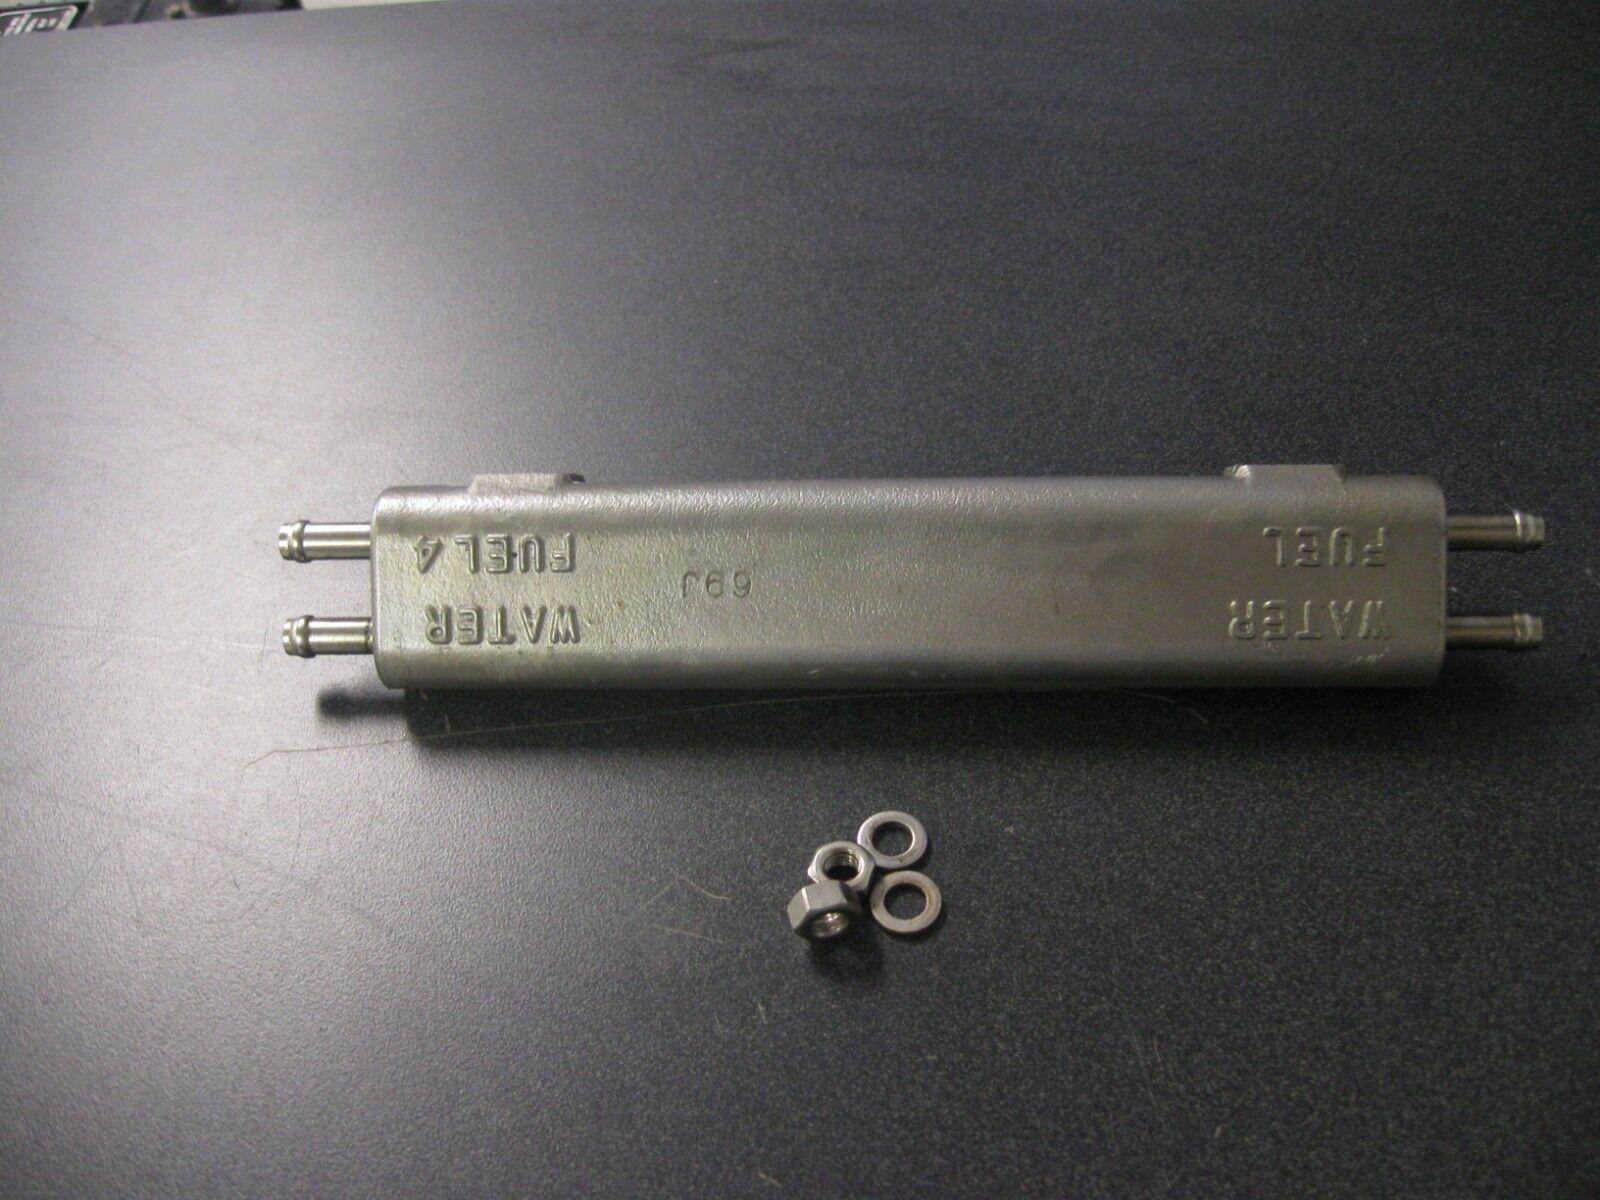 Yamaha F225TURA Außenborder F225TURA Yamaha Benzin Kühler 69J-21841-00-00 12a91a